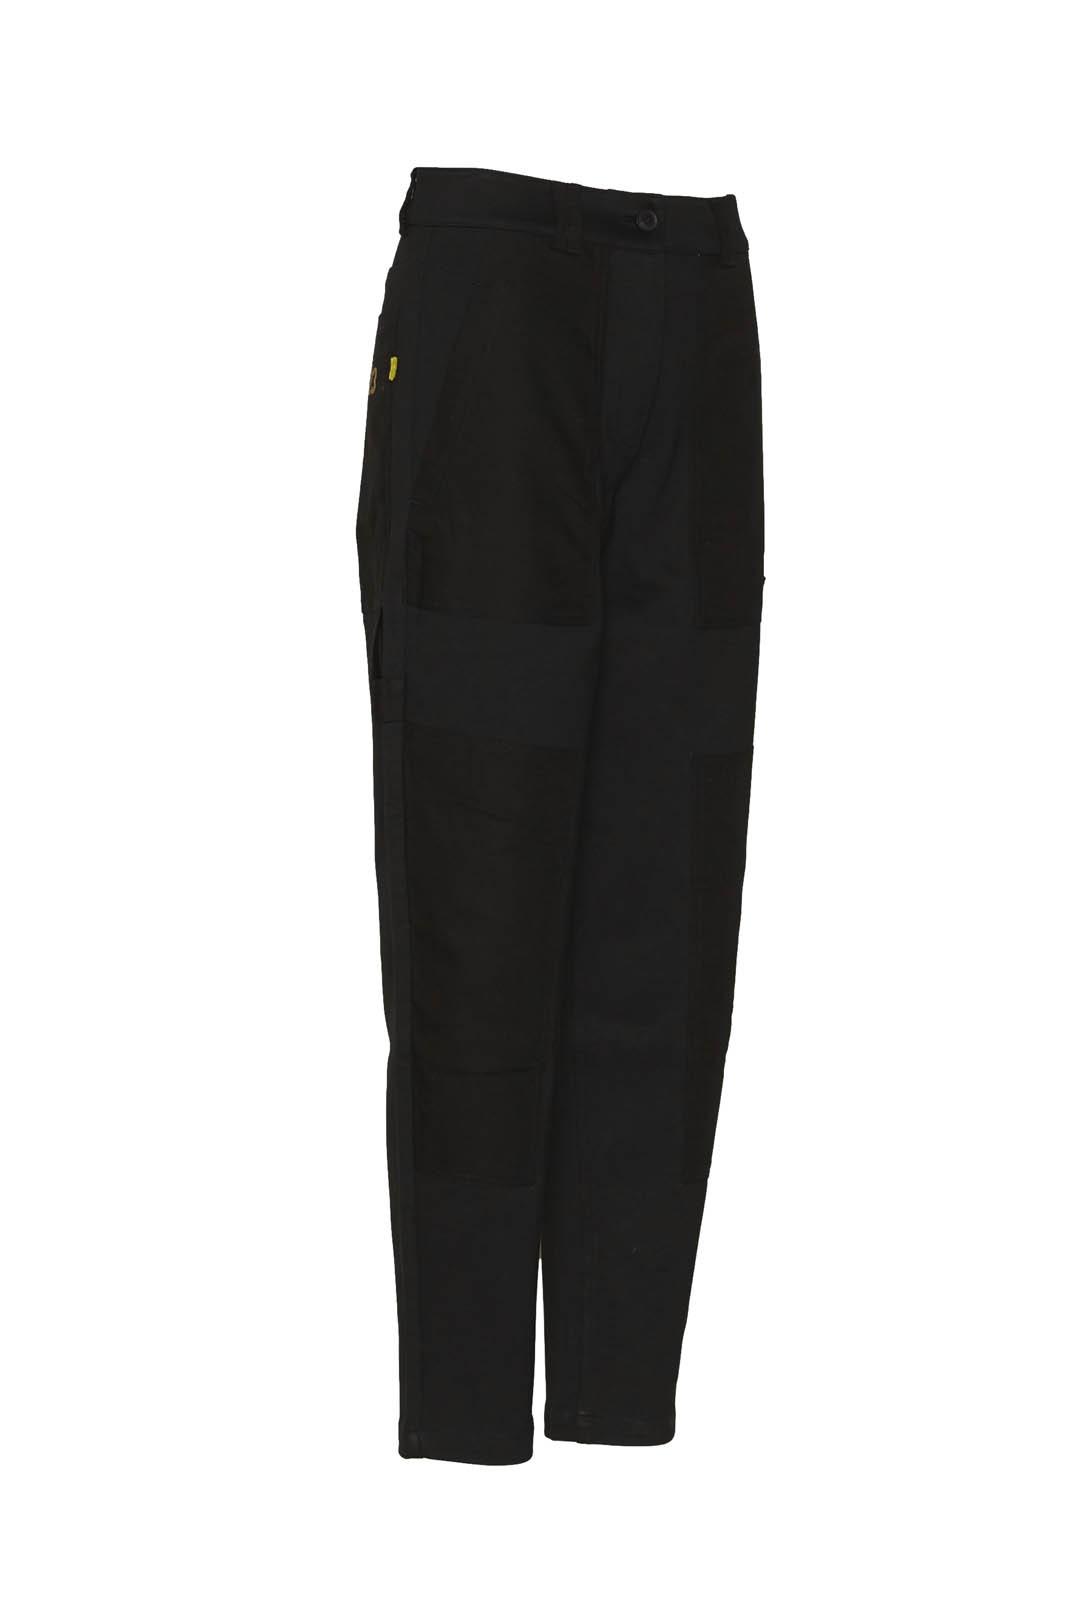 Loose casual stretch cotton sweatpants   3